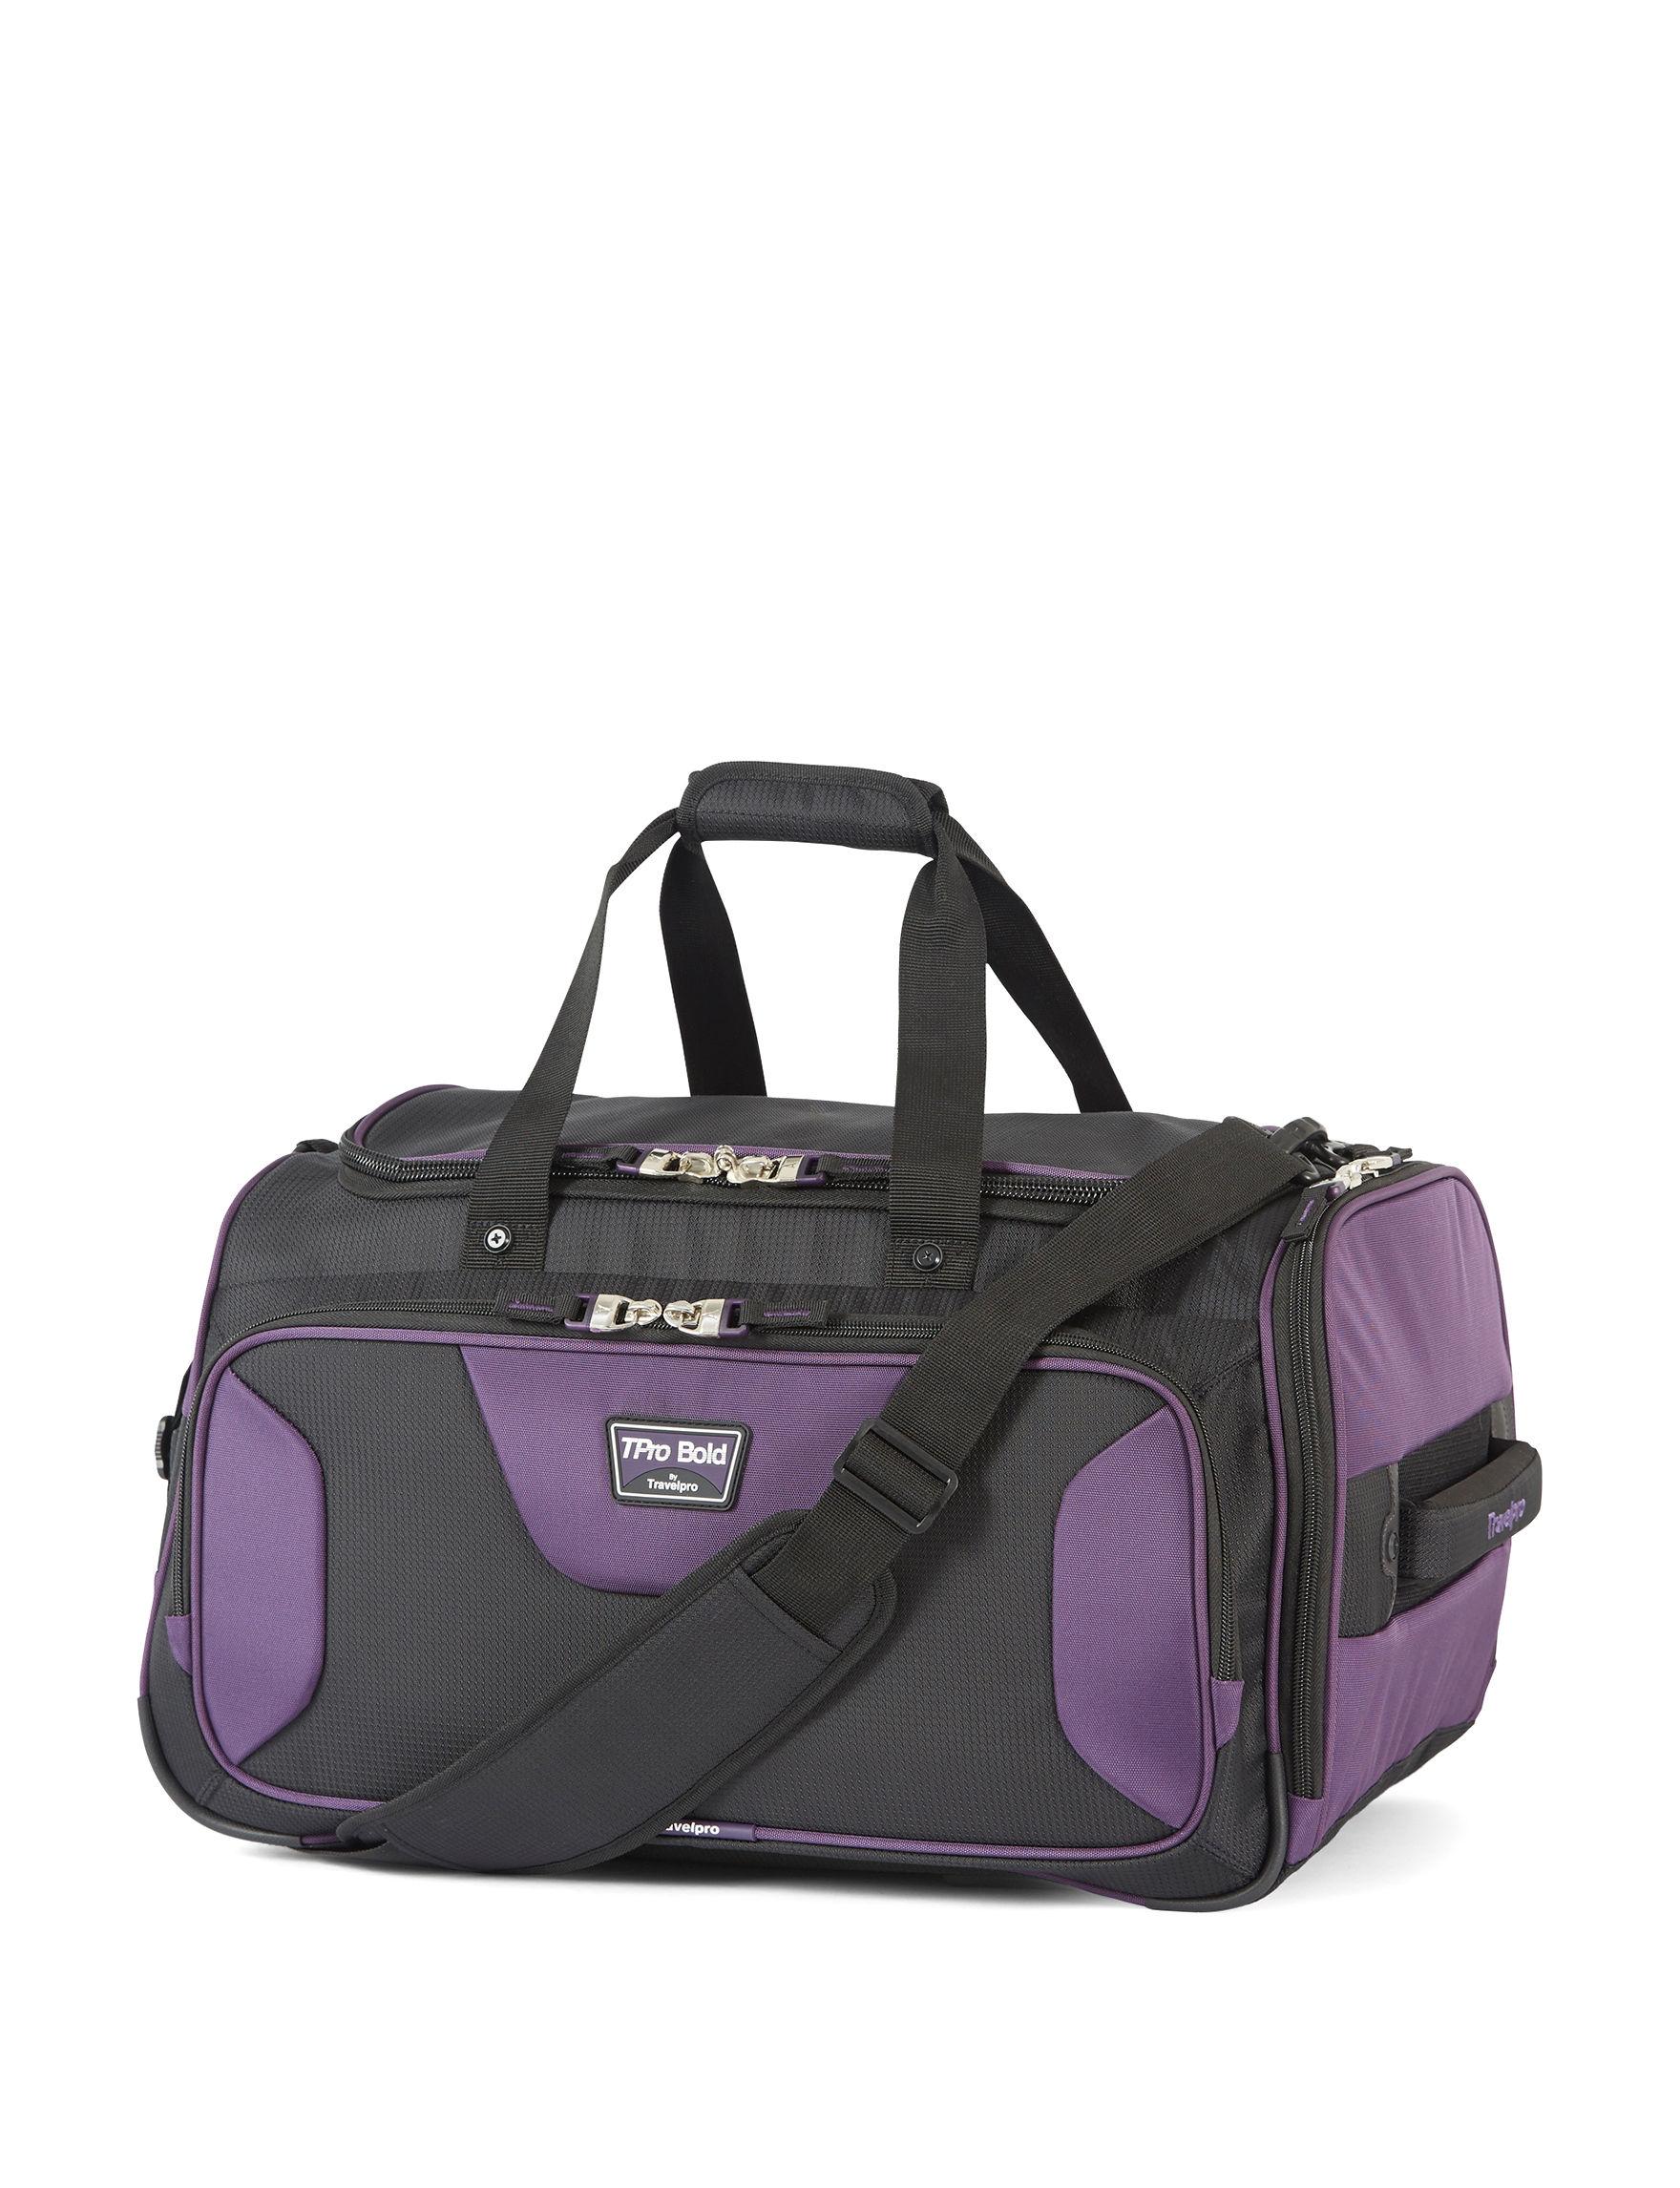 Travelpro Black/ Purple Duffle Bags